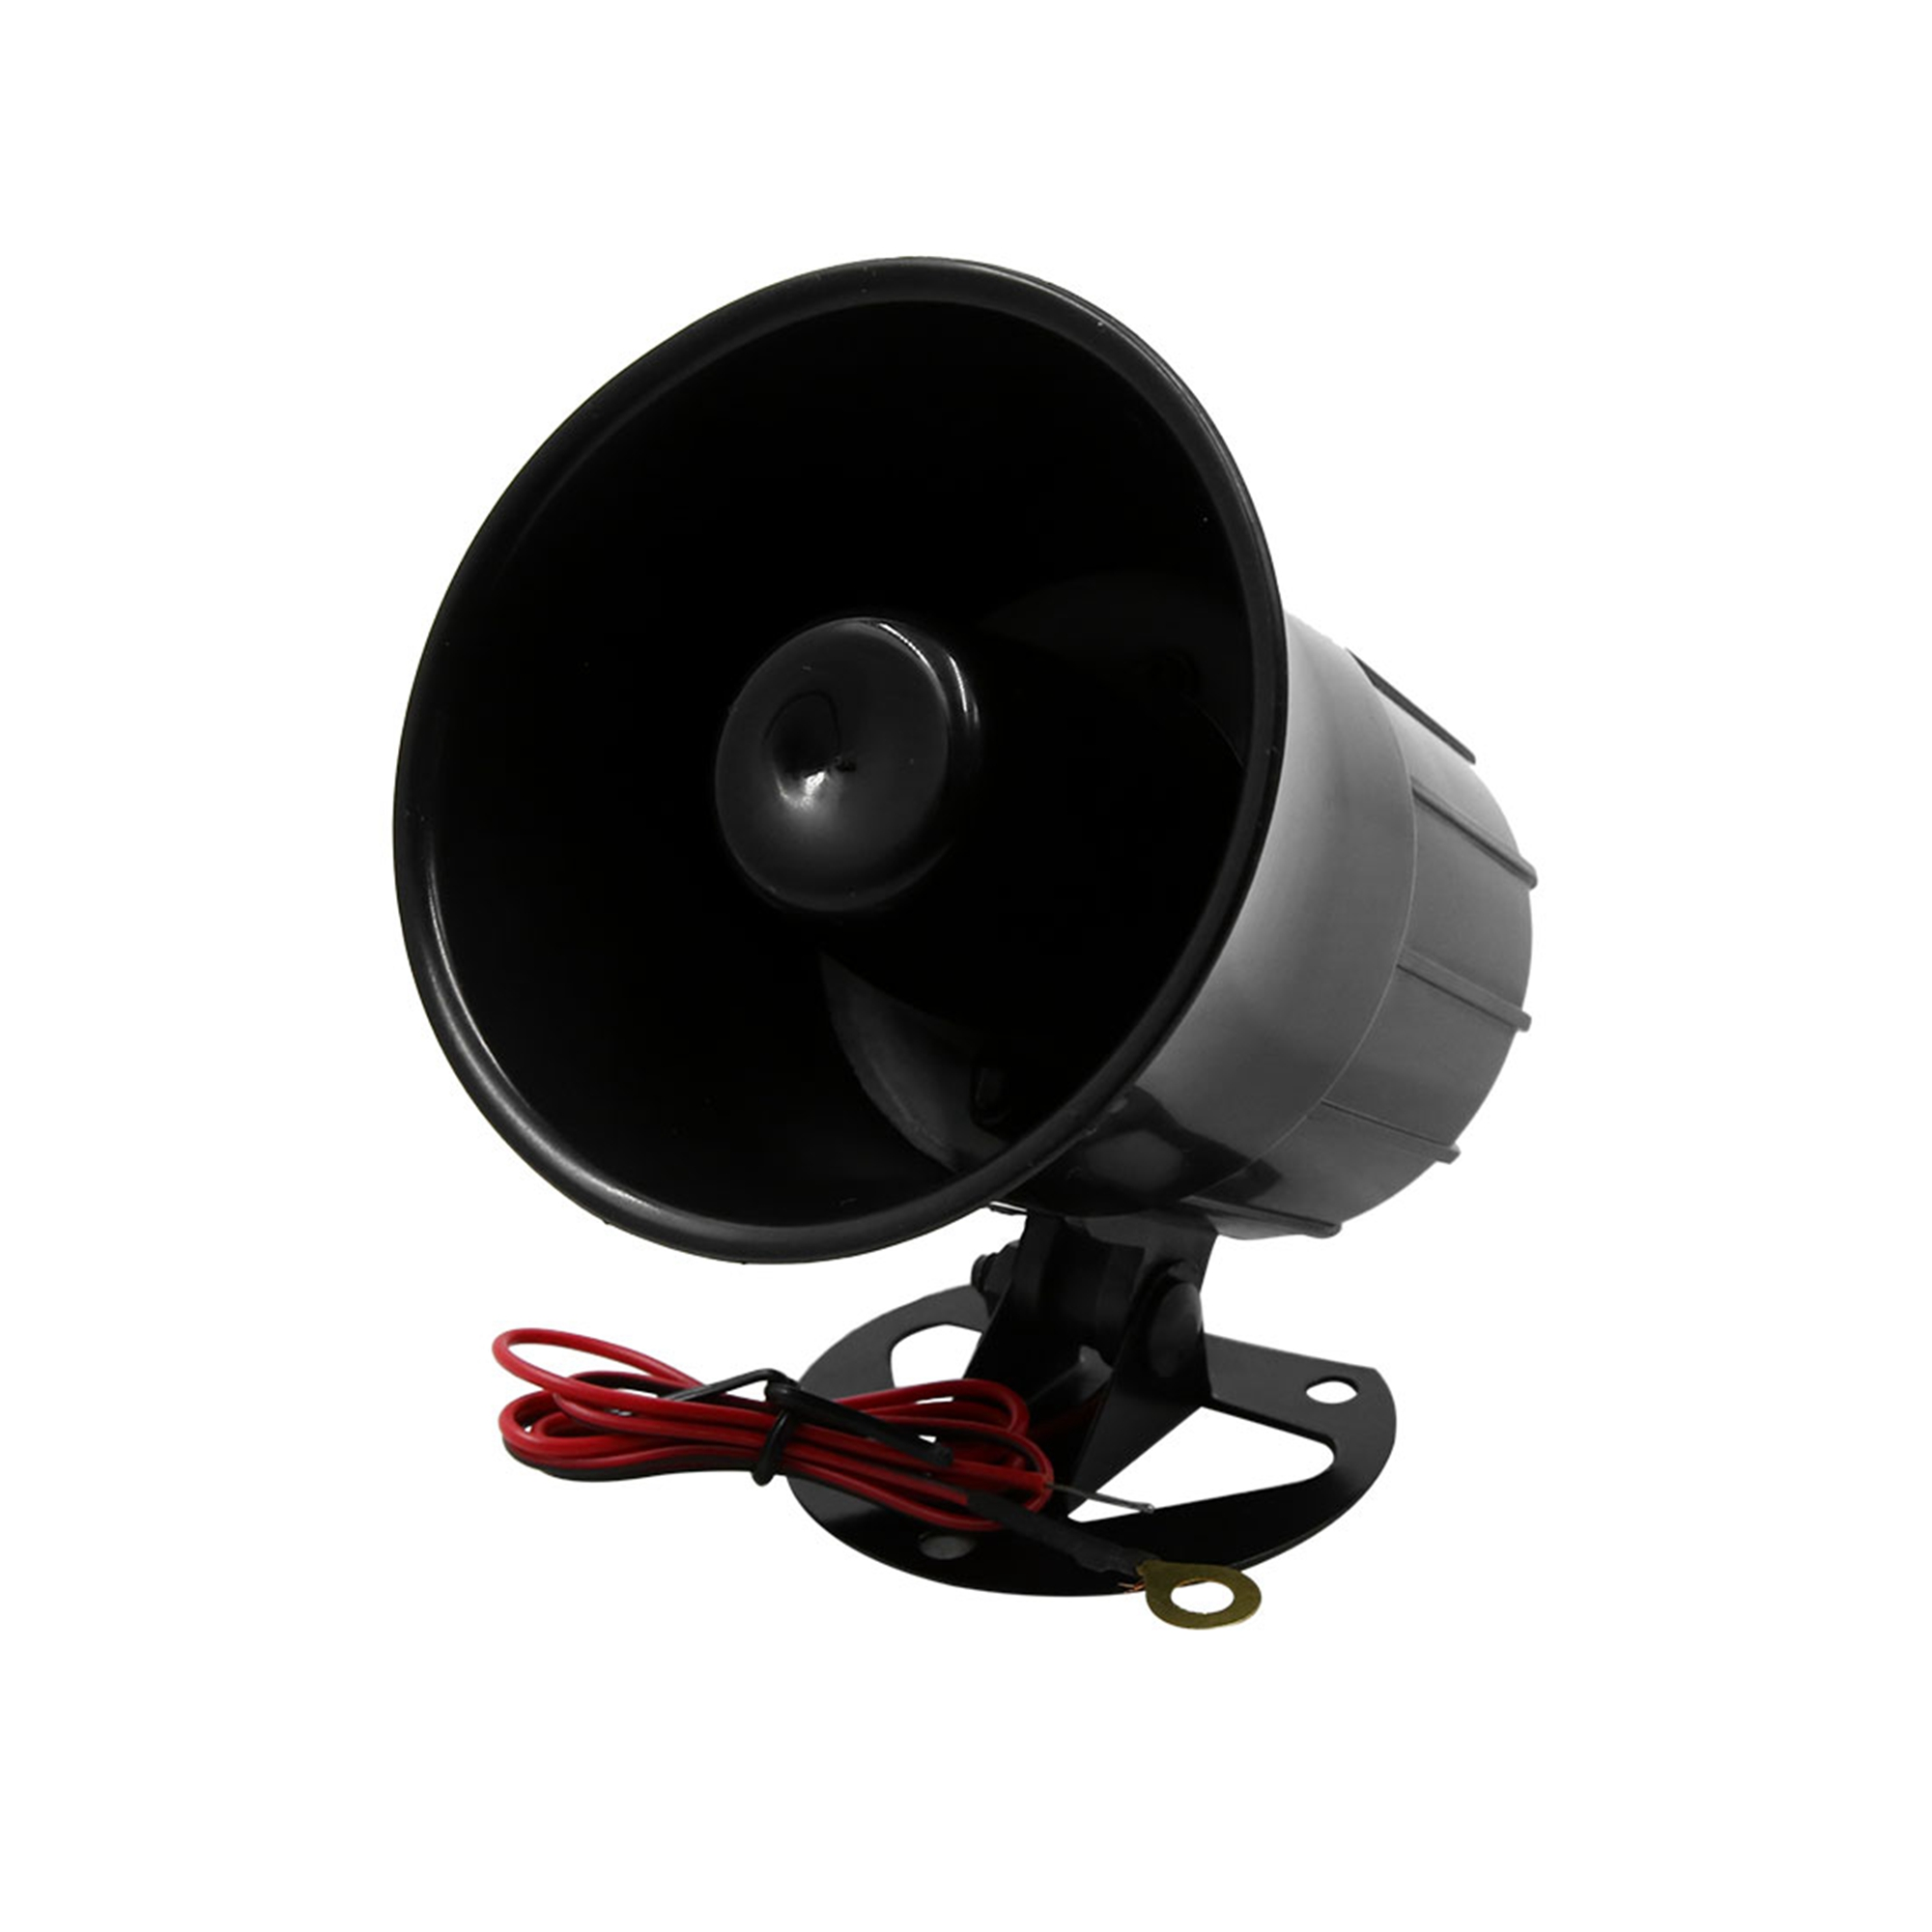 Car Siren Horn Waterproof Electric Trumpet Speaker DC12V 15W 105db Black